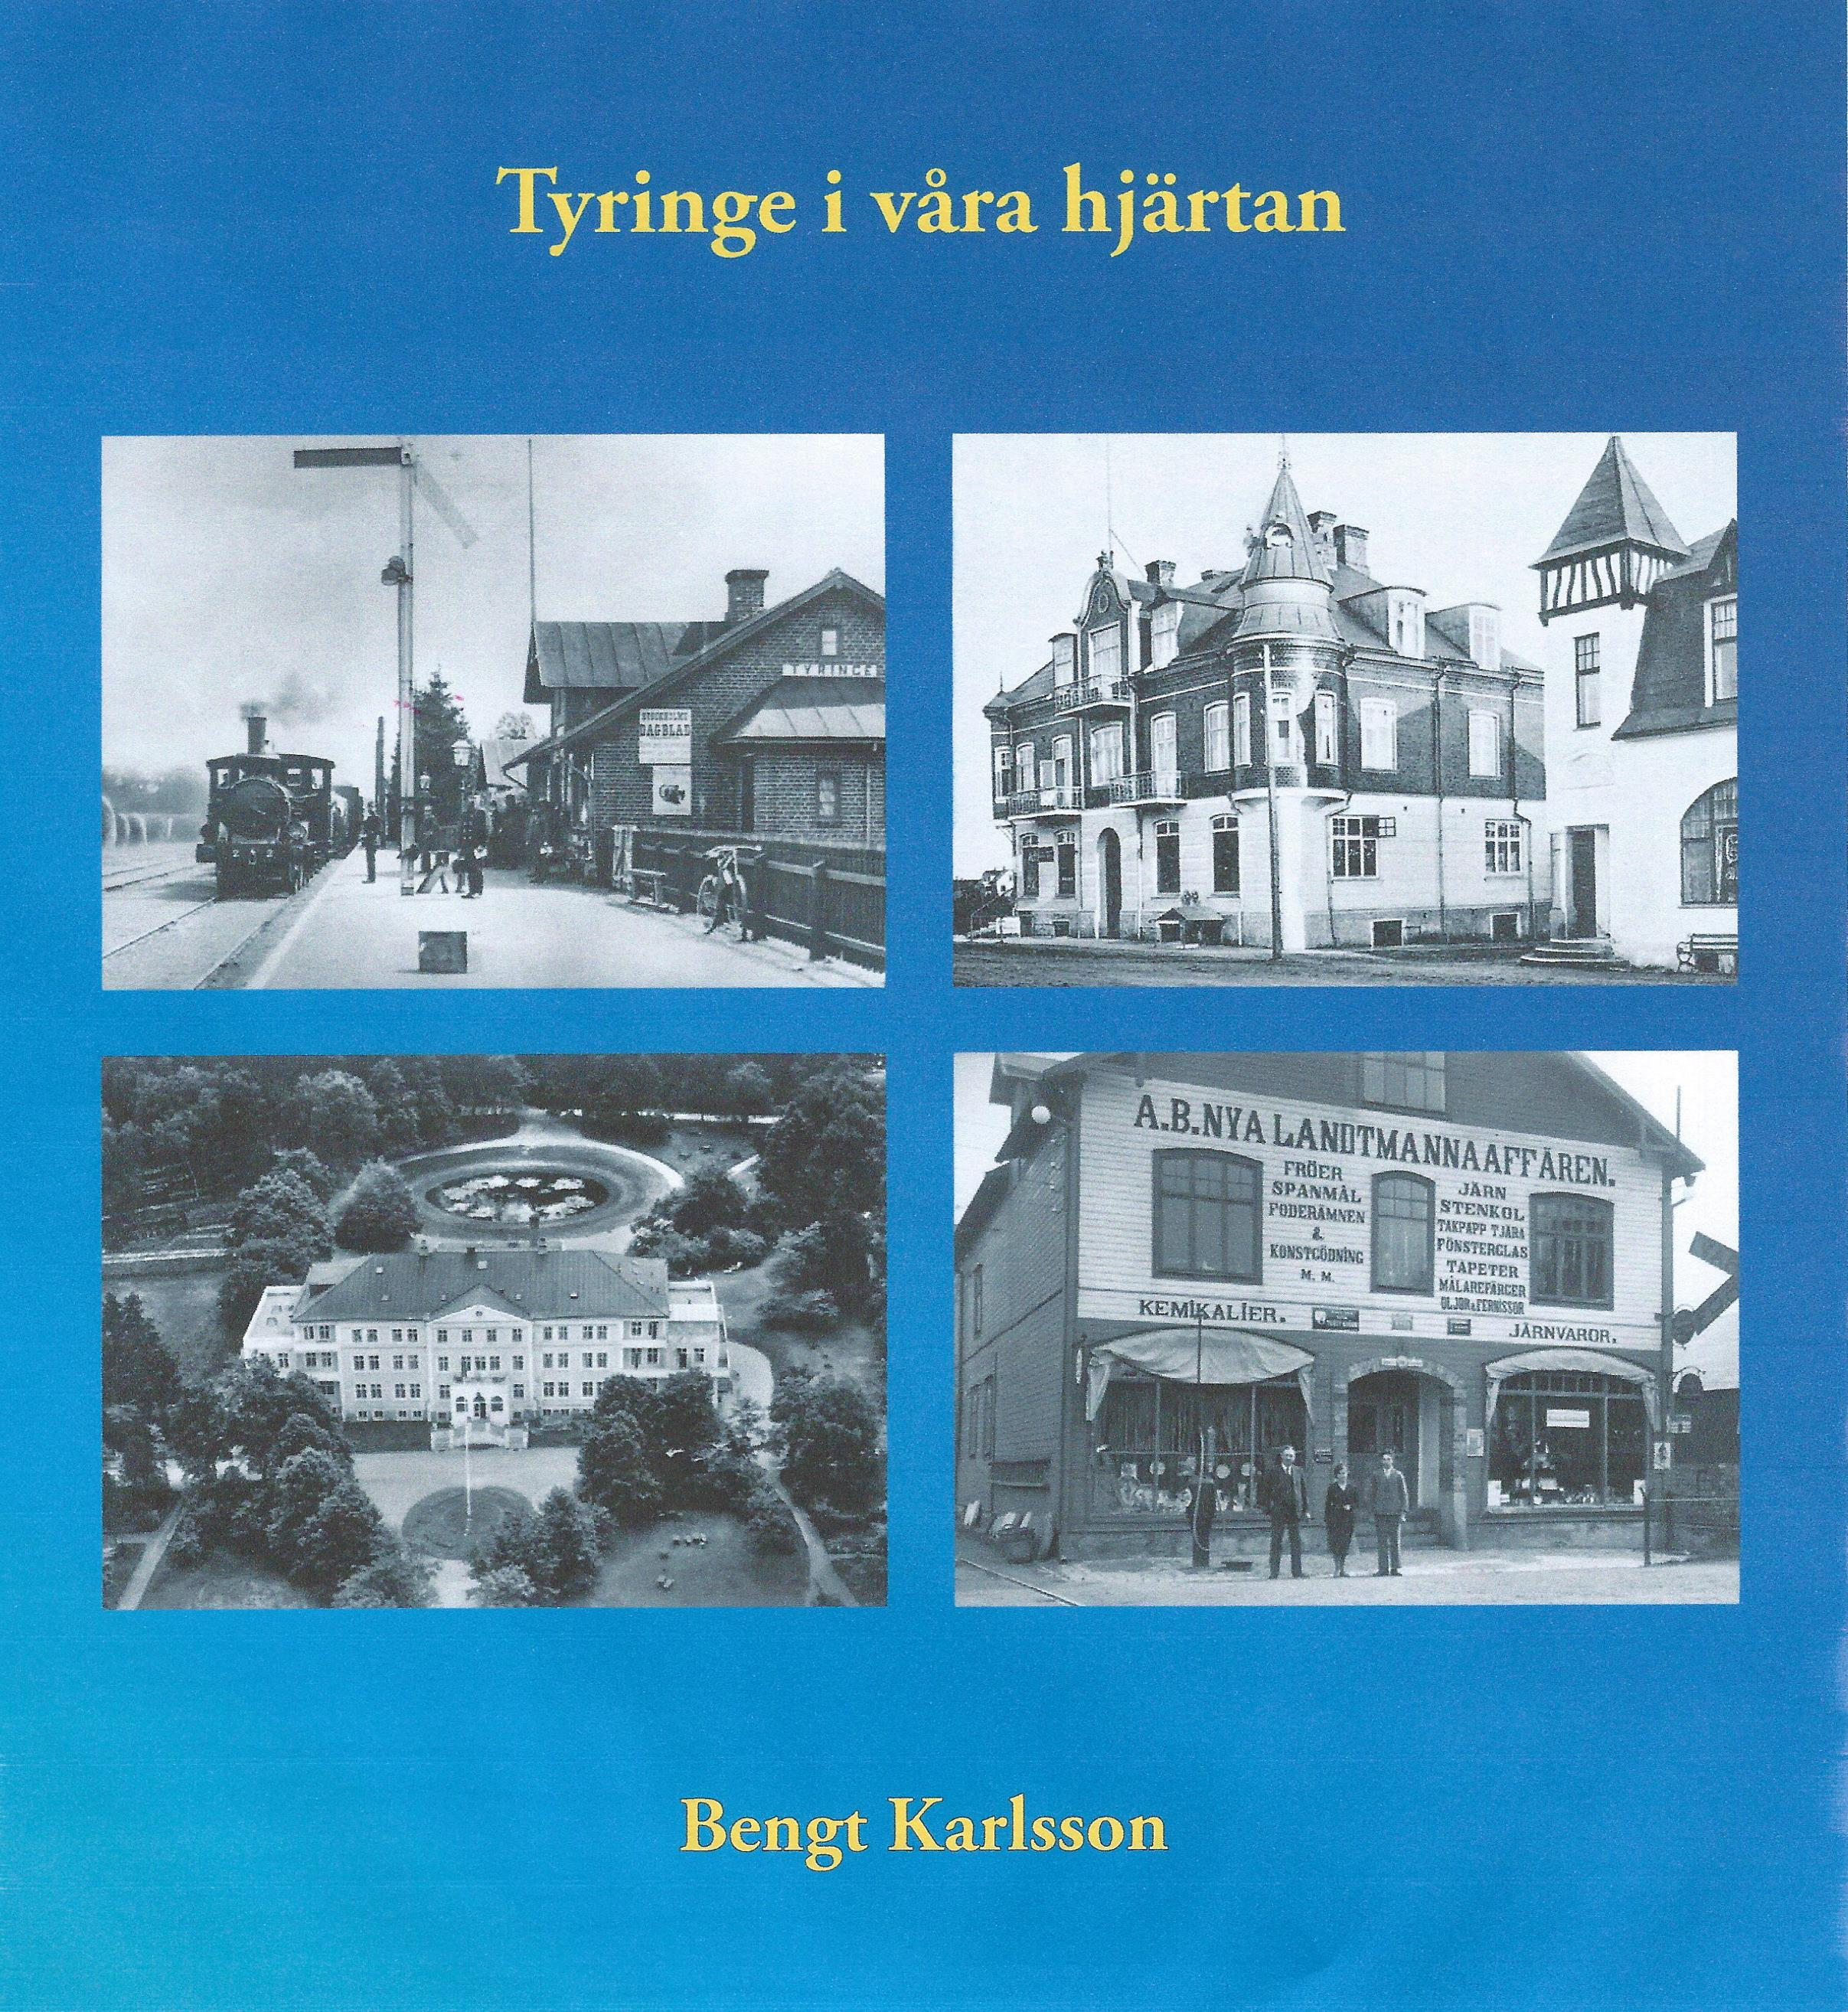 Tyringe i våra hjärtan, Bengt Karlsson